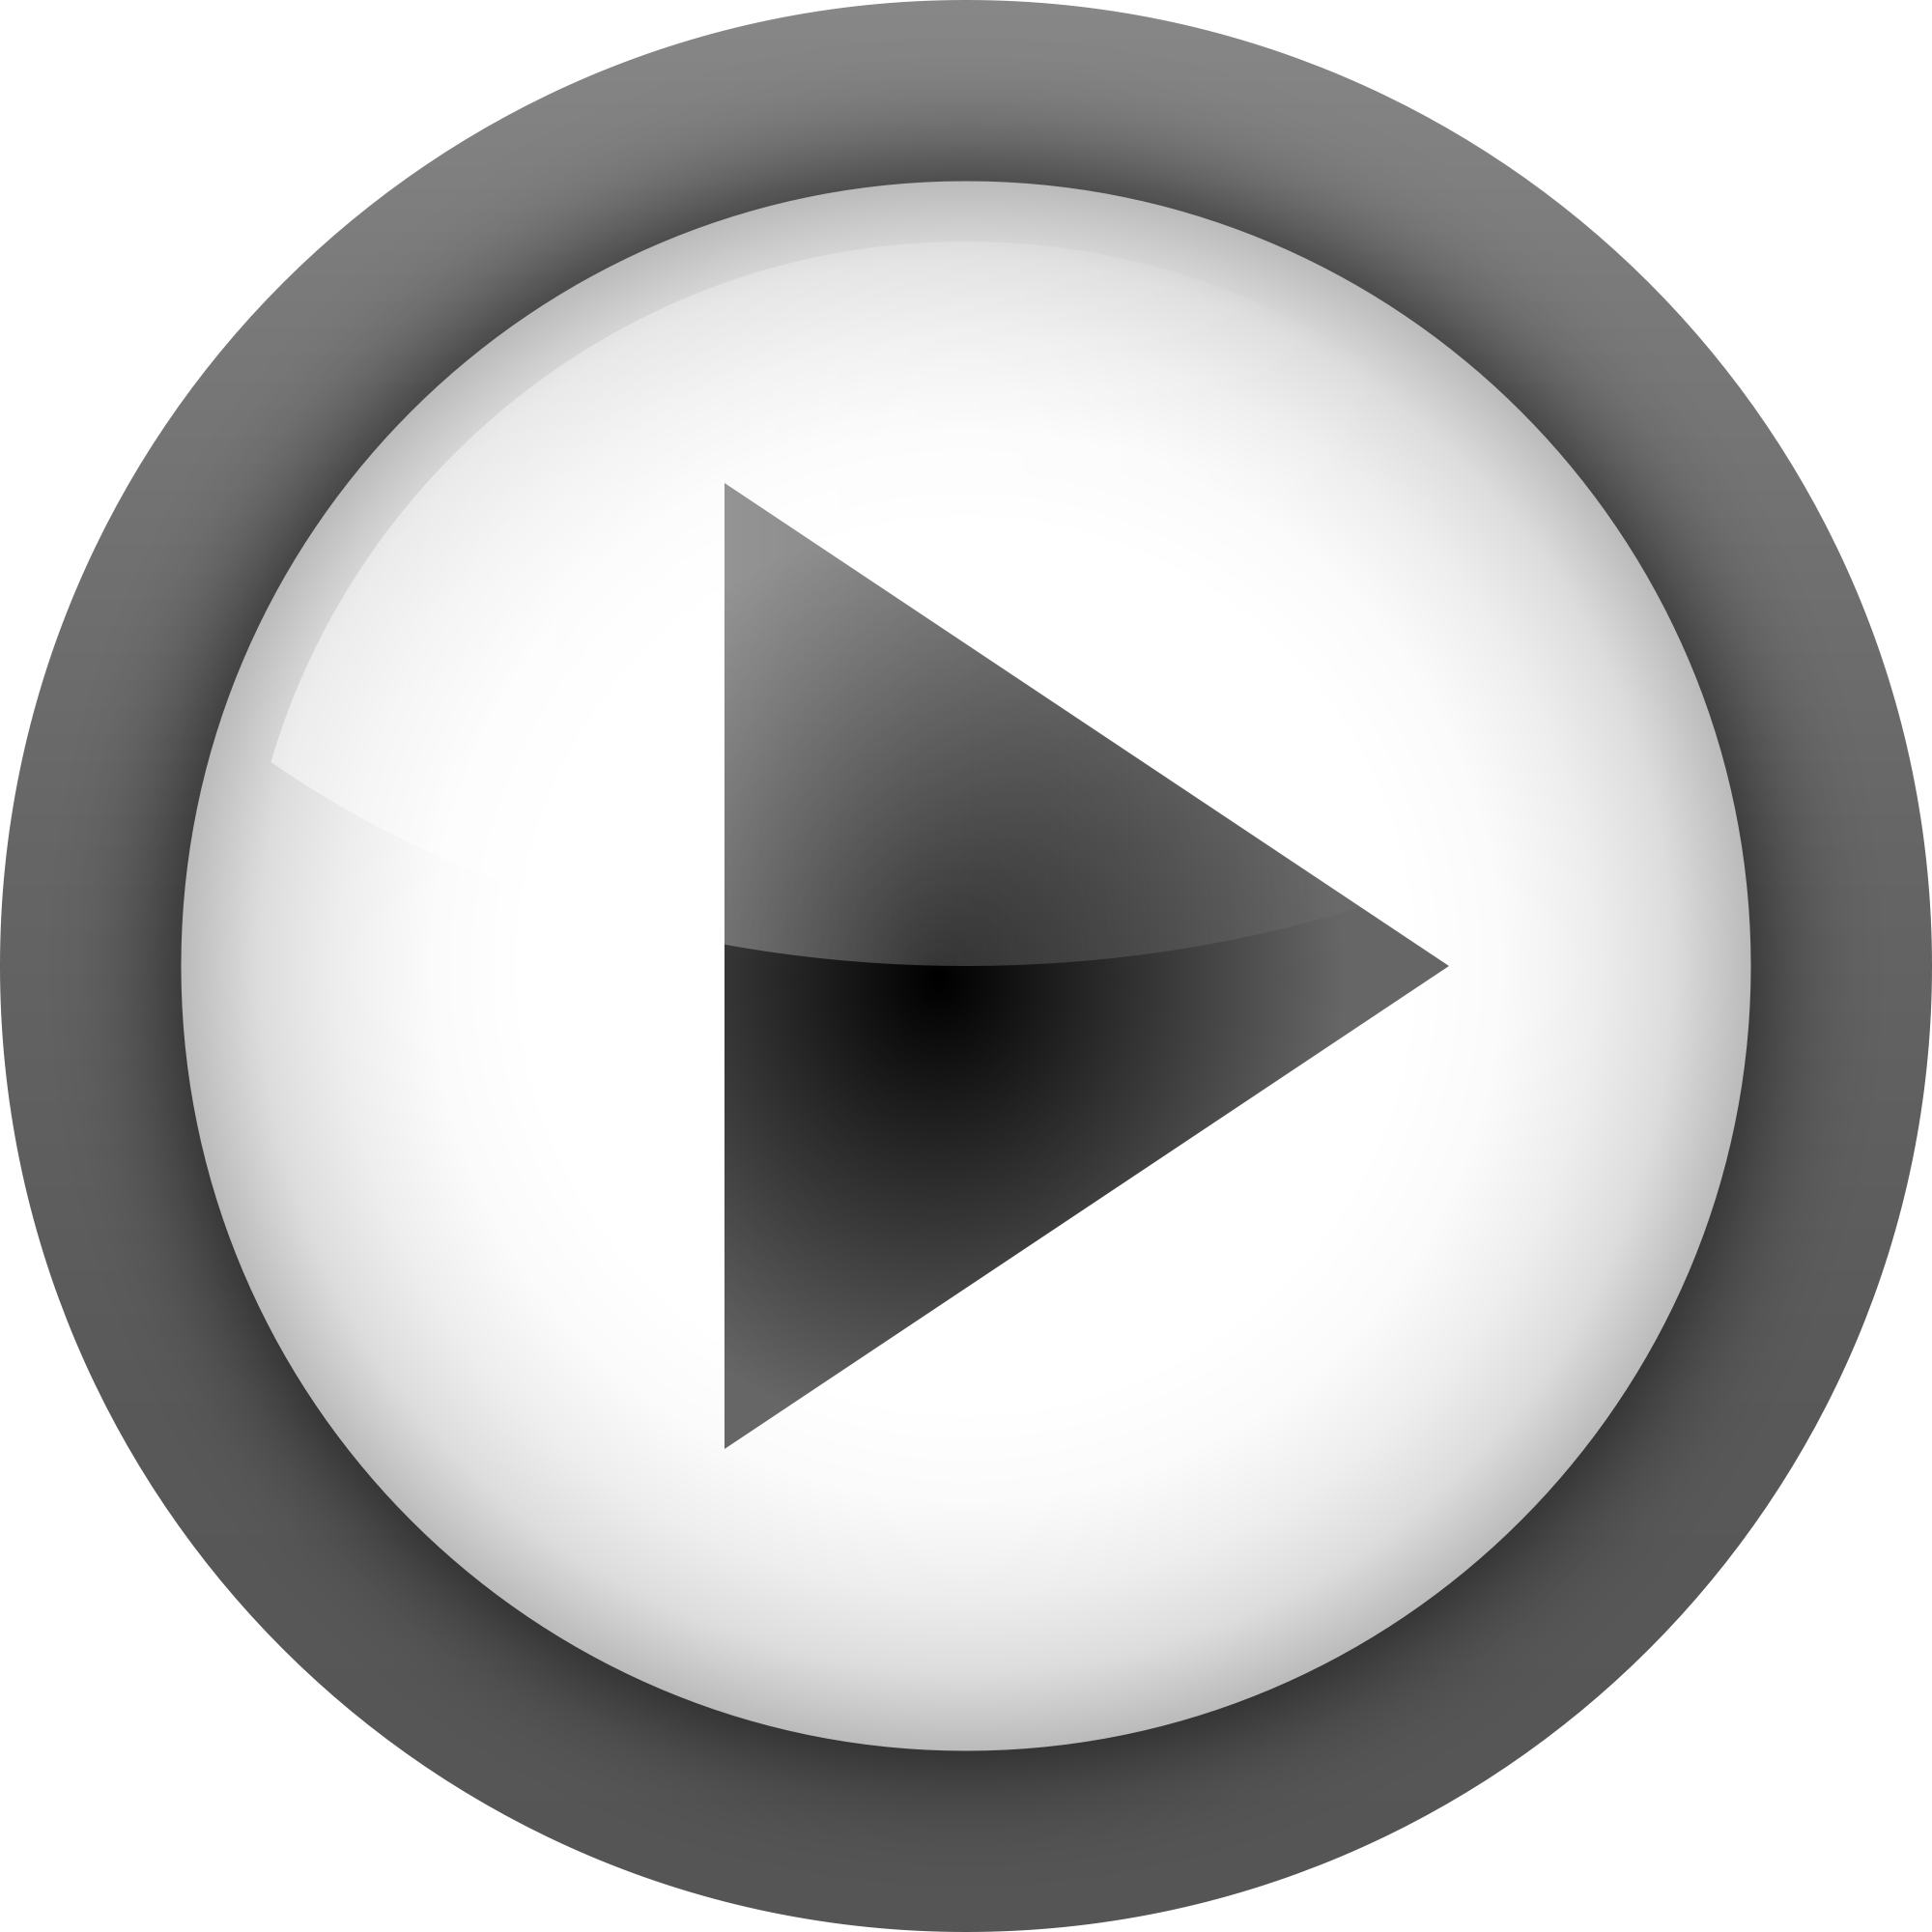 video-now-player-black-and-white-fuck-pornfree